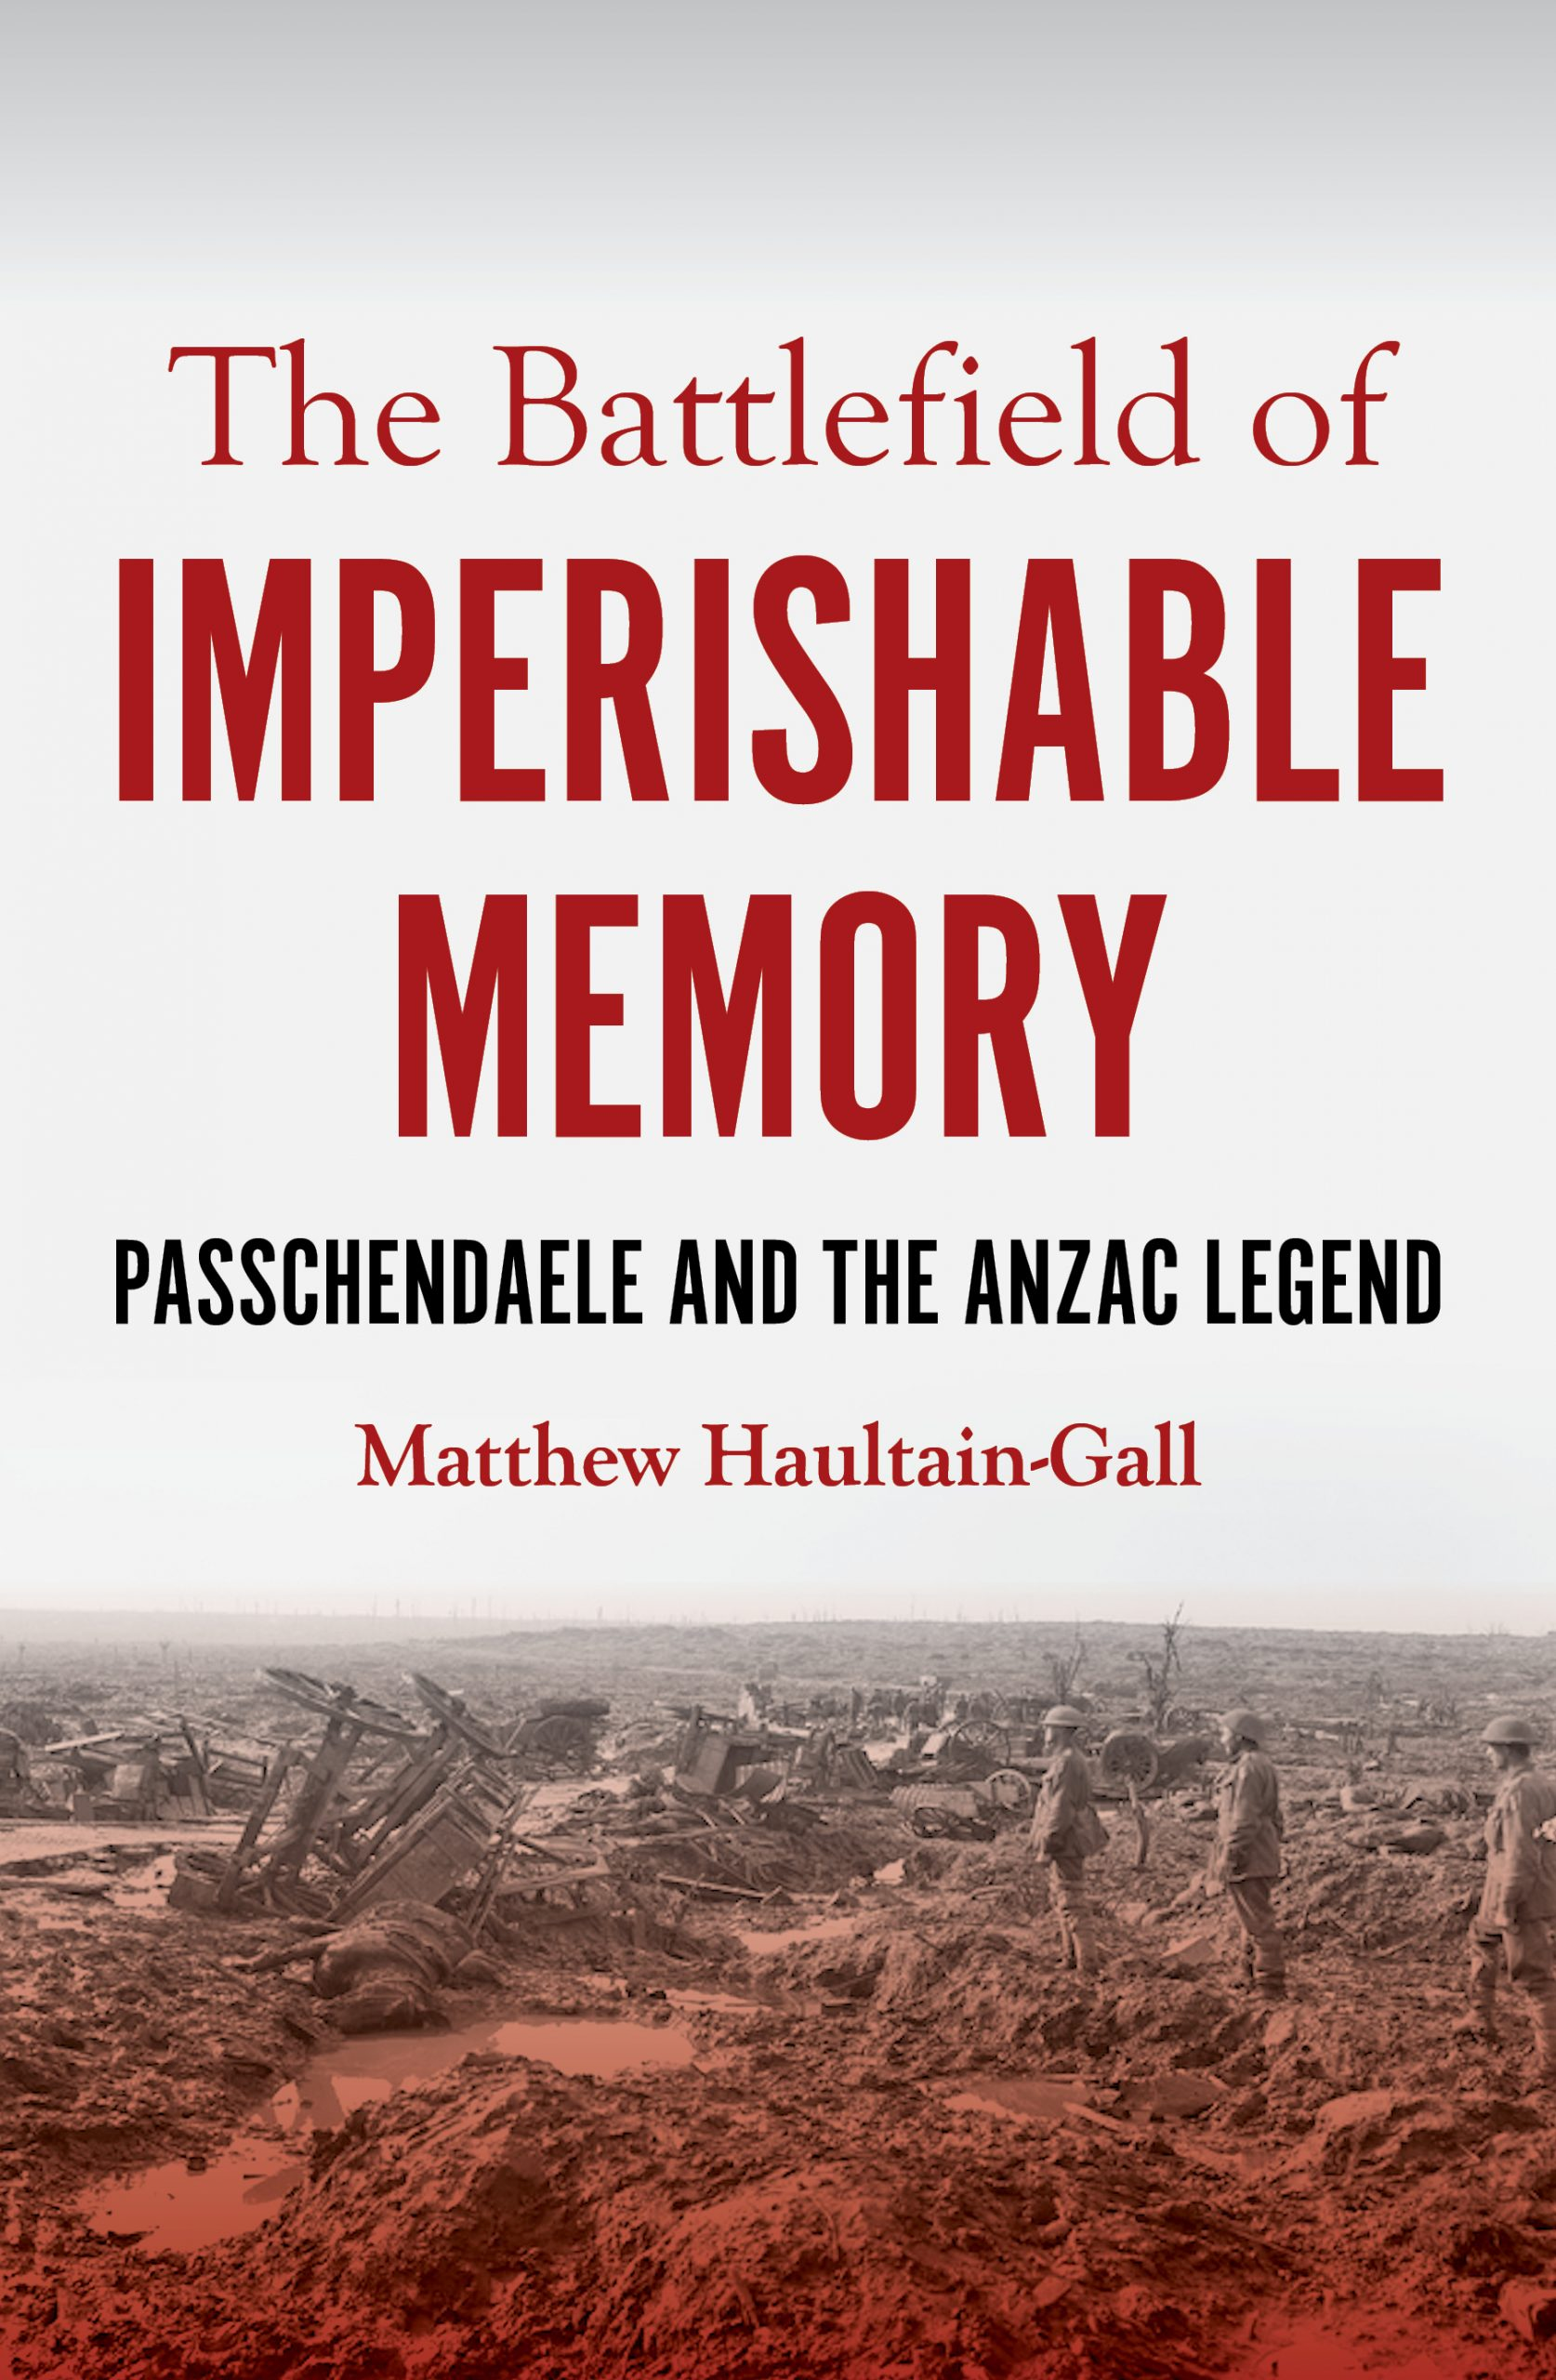 The Battlefield of Imperishable Memory